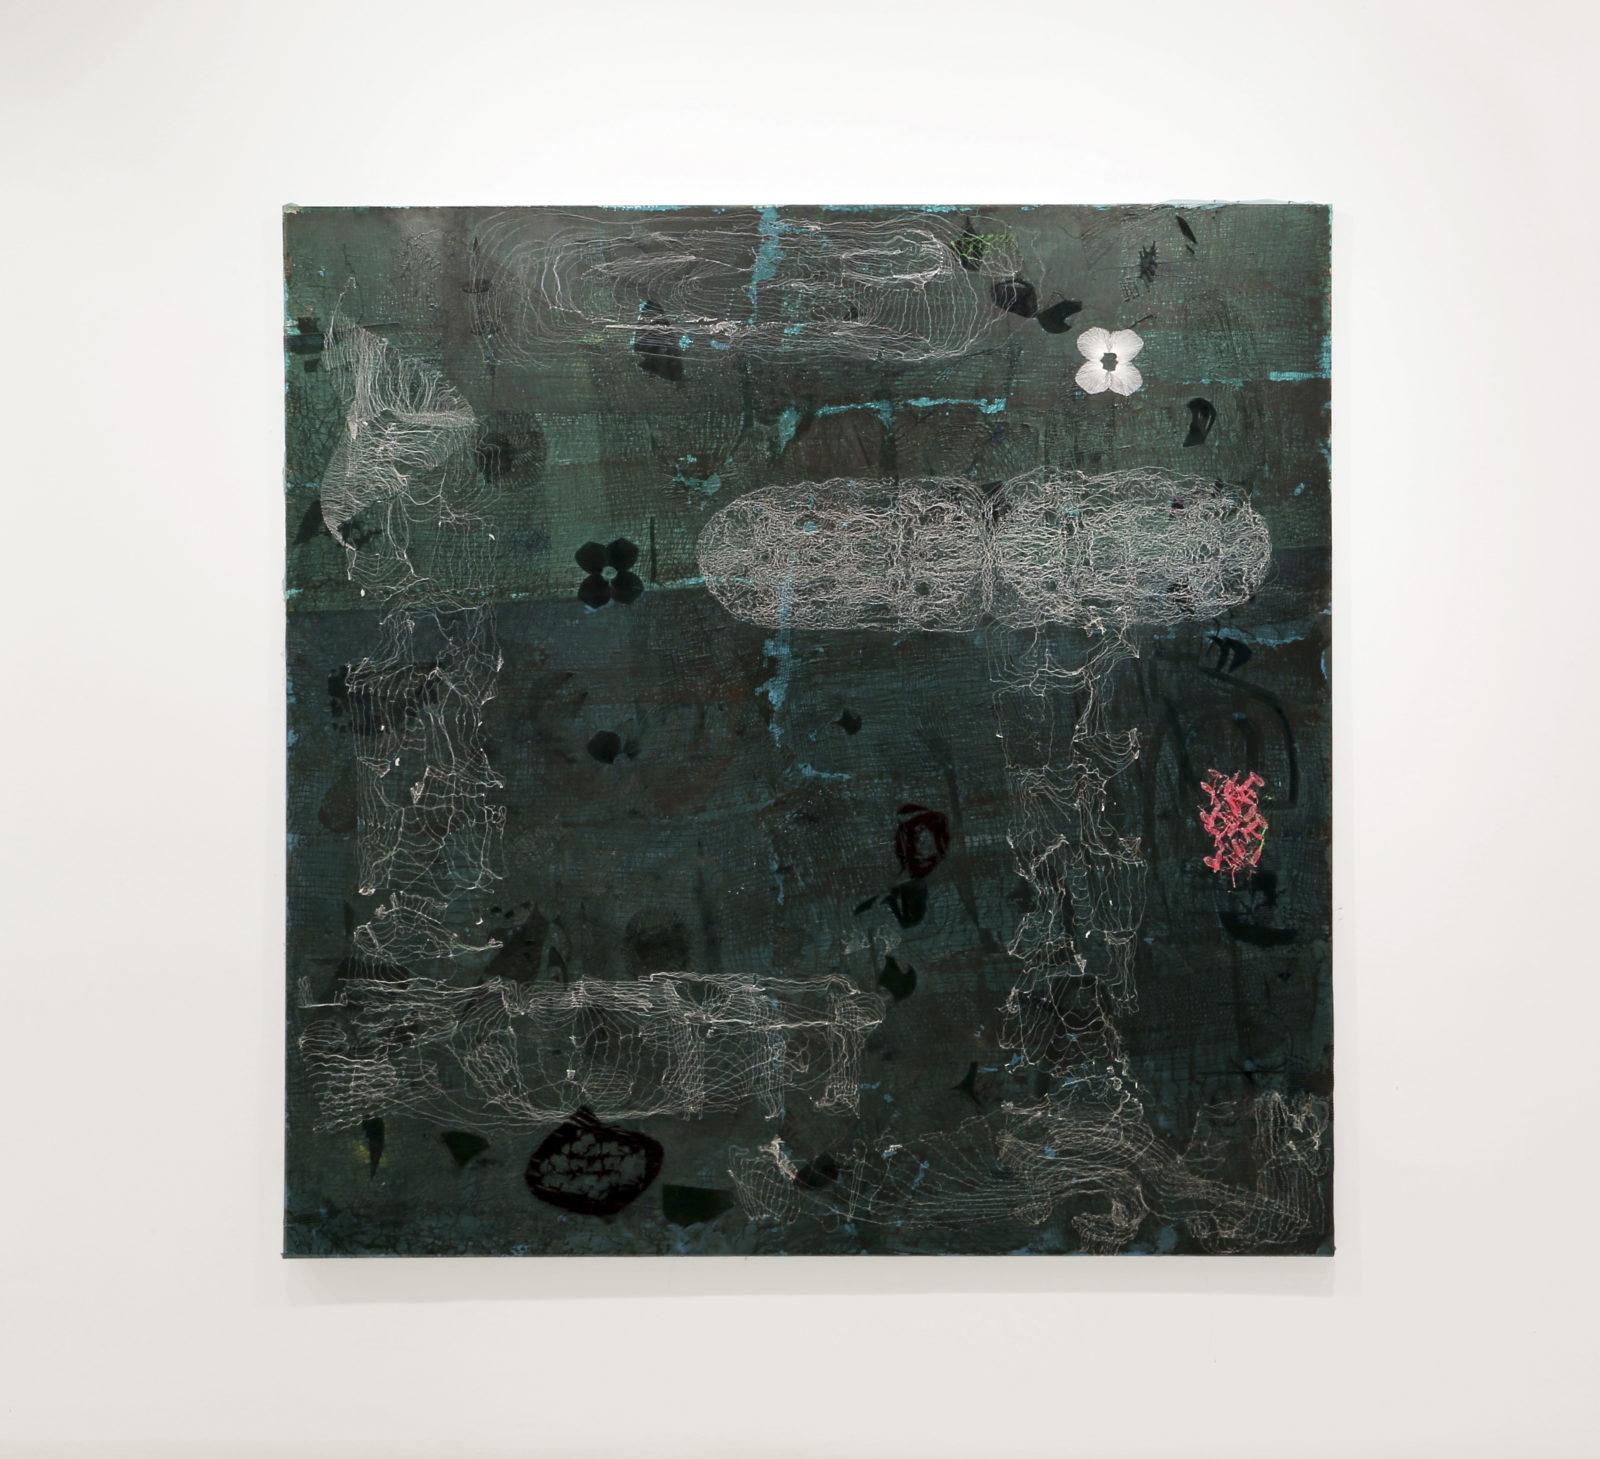 José María Sicilia LA LOCURA DEL VER (VERDE), 2017 Technique mixte sur bois 200 x 200 cm , serial collector, article de mina sidi ali, go out magazine avril 2018